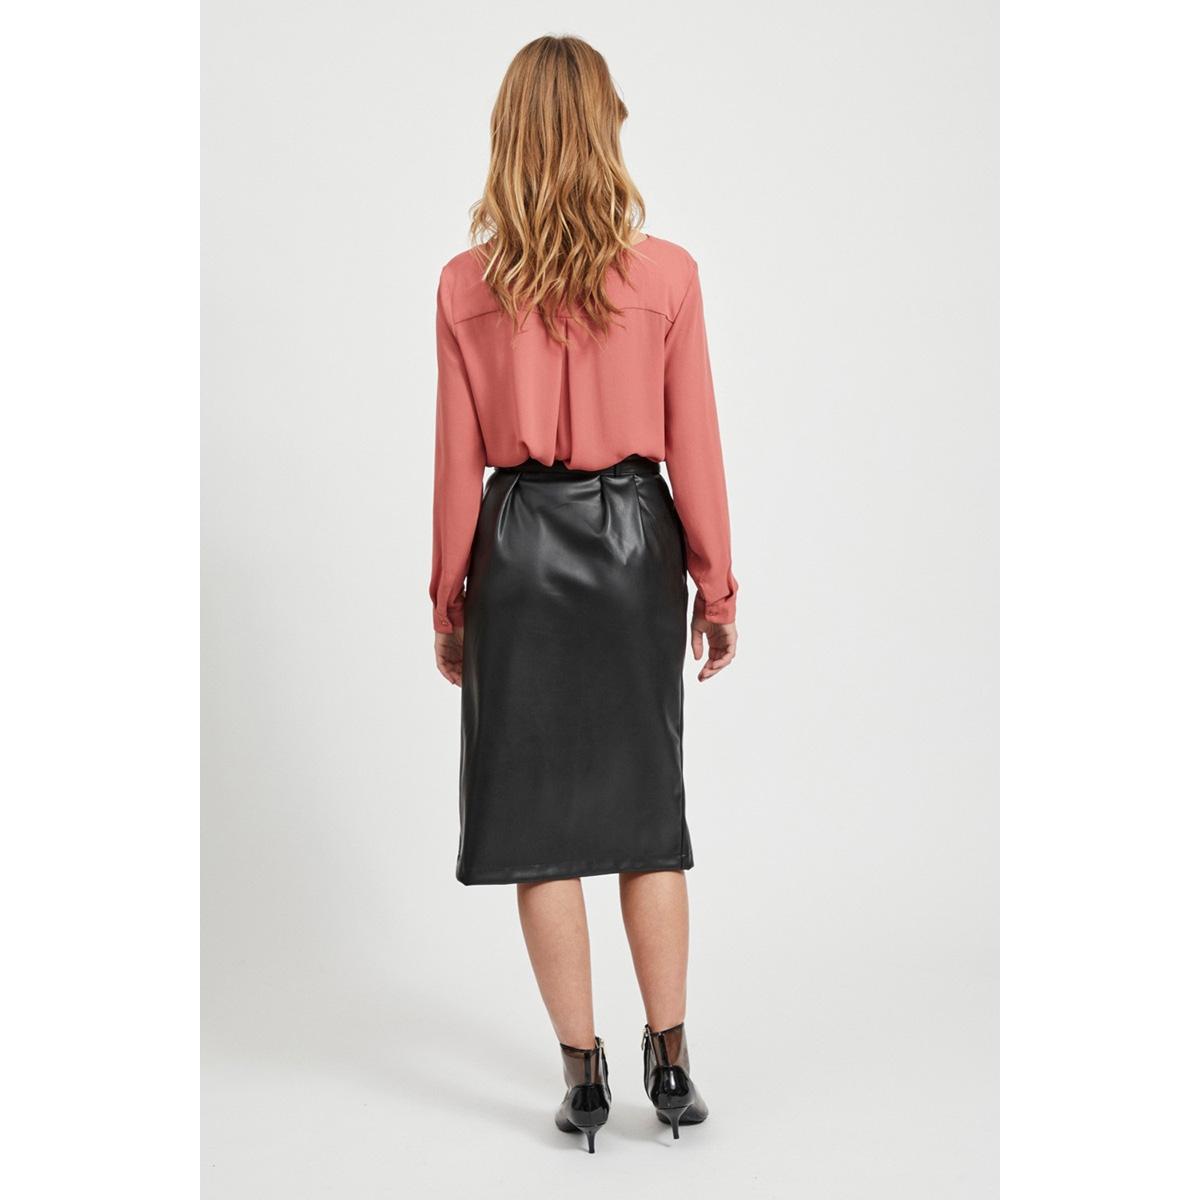 vilucy l/s shirt - noos 14044253 vila blouse dusty cedar